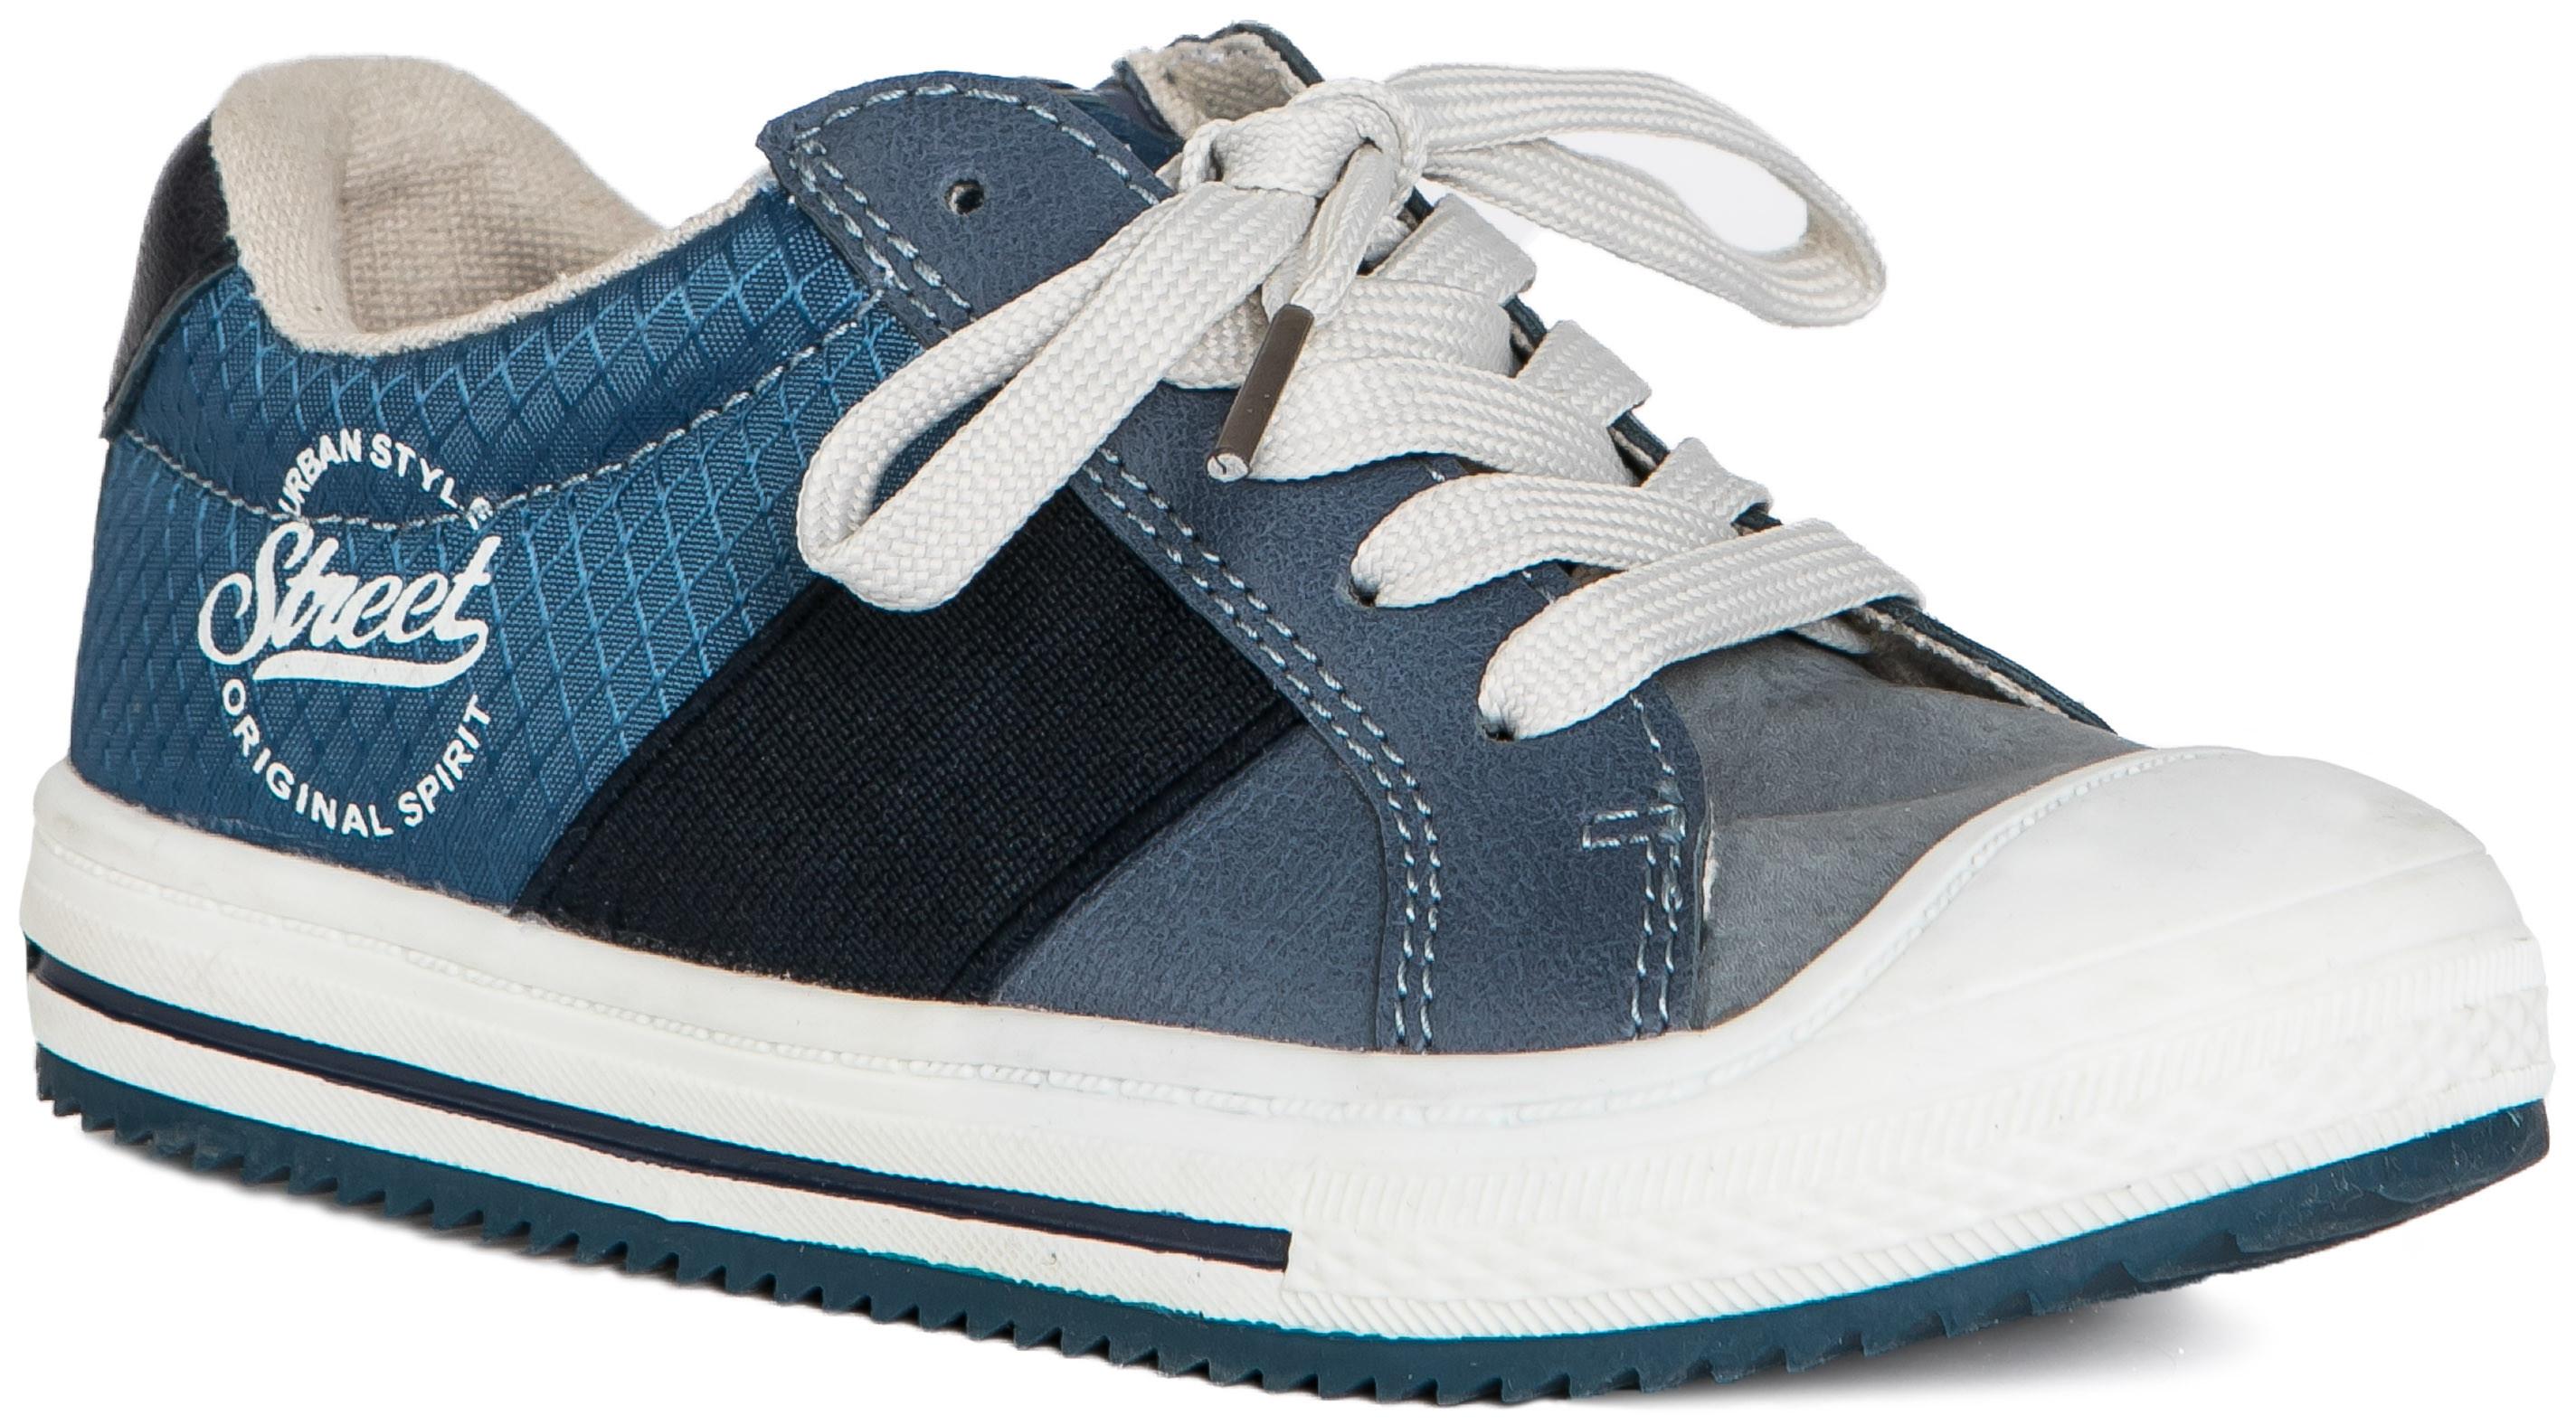 Кроссовки Barkito 382989 полуботинки для мальчика elegami цвет темно синий 5 522151902 размер 36